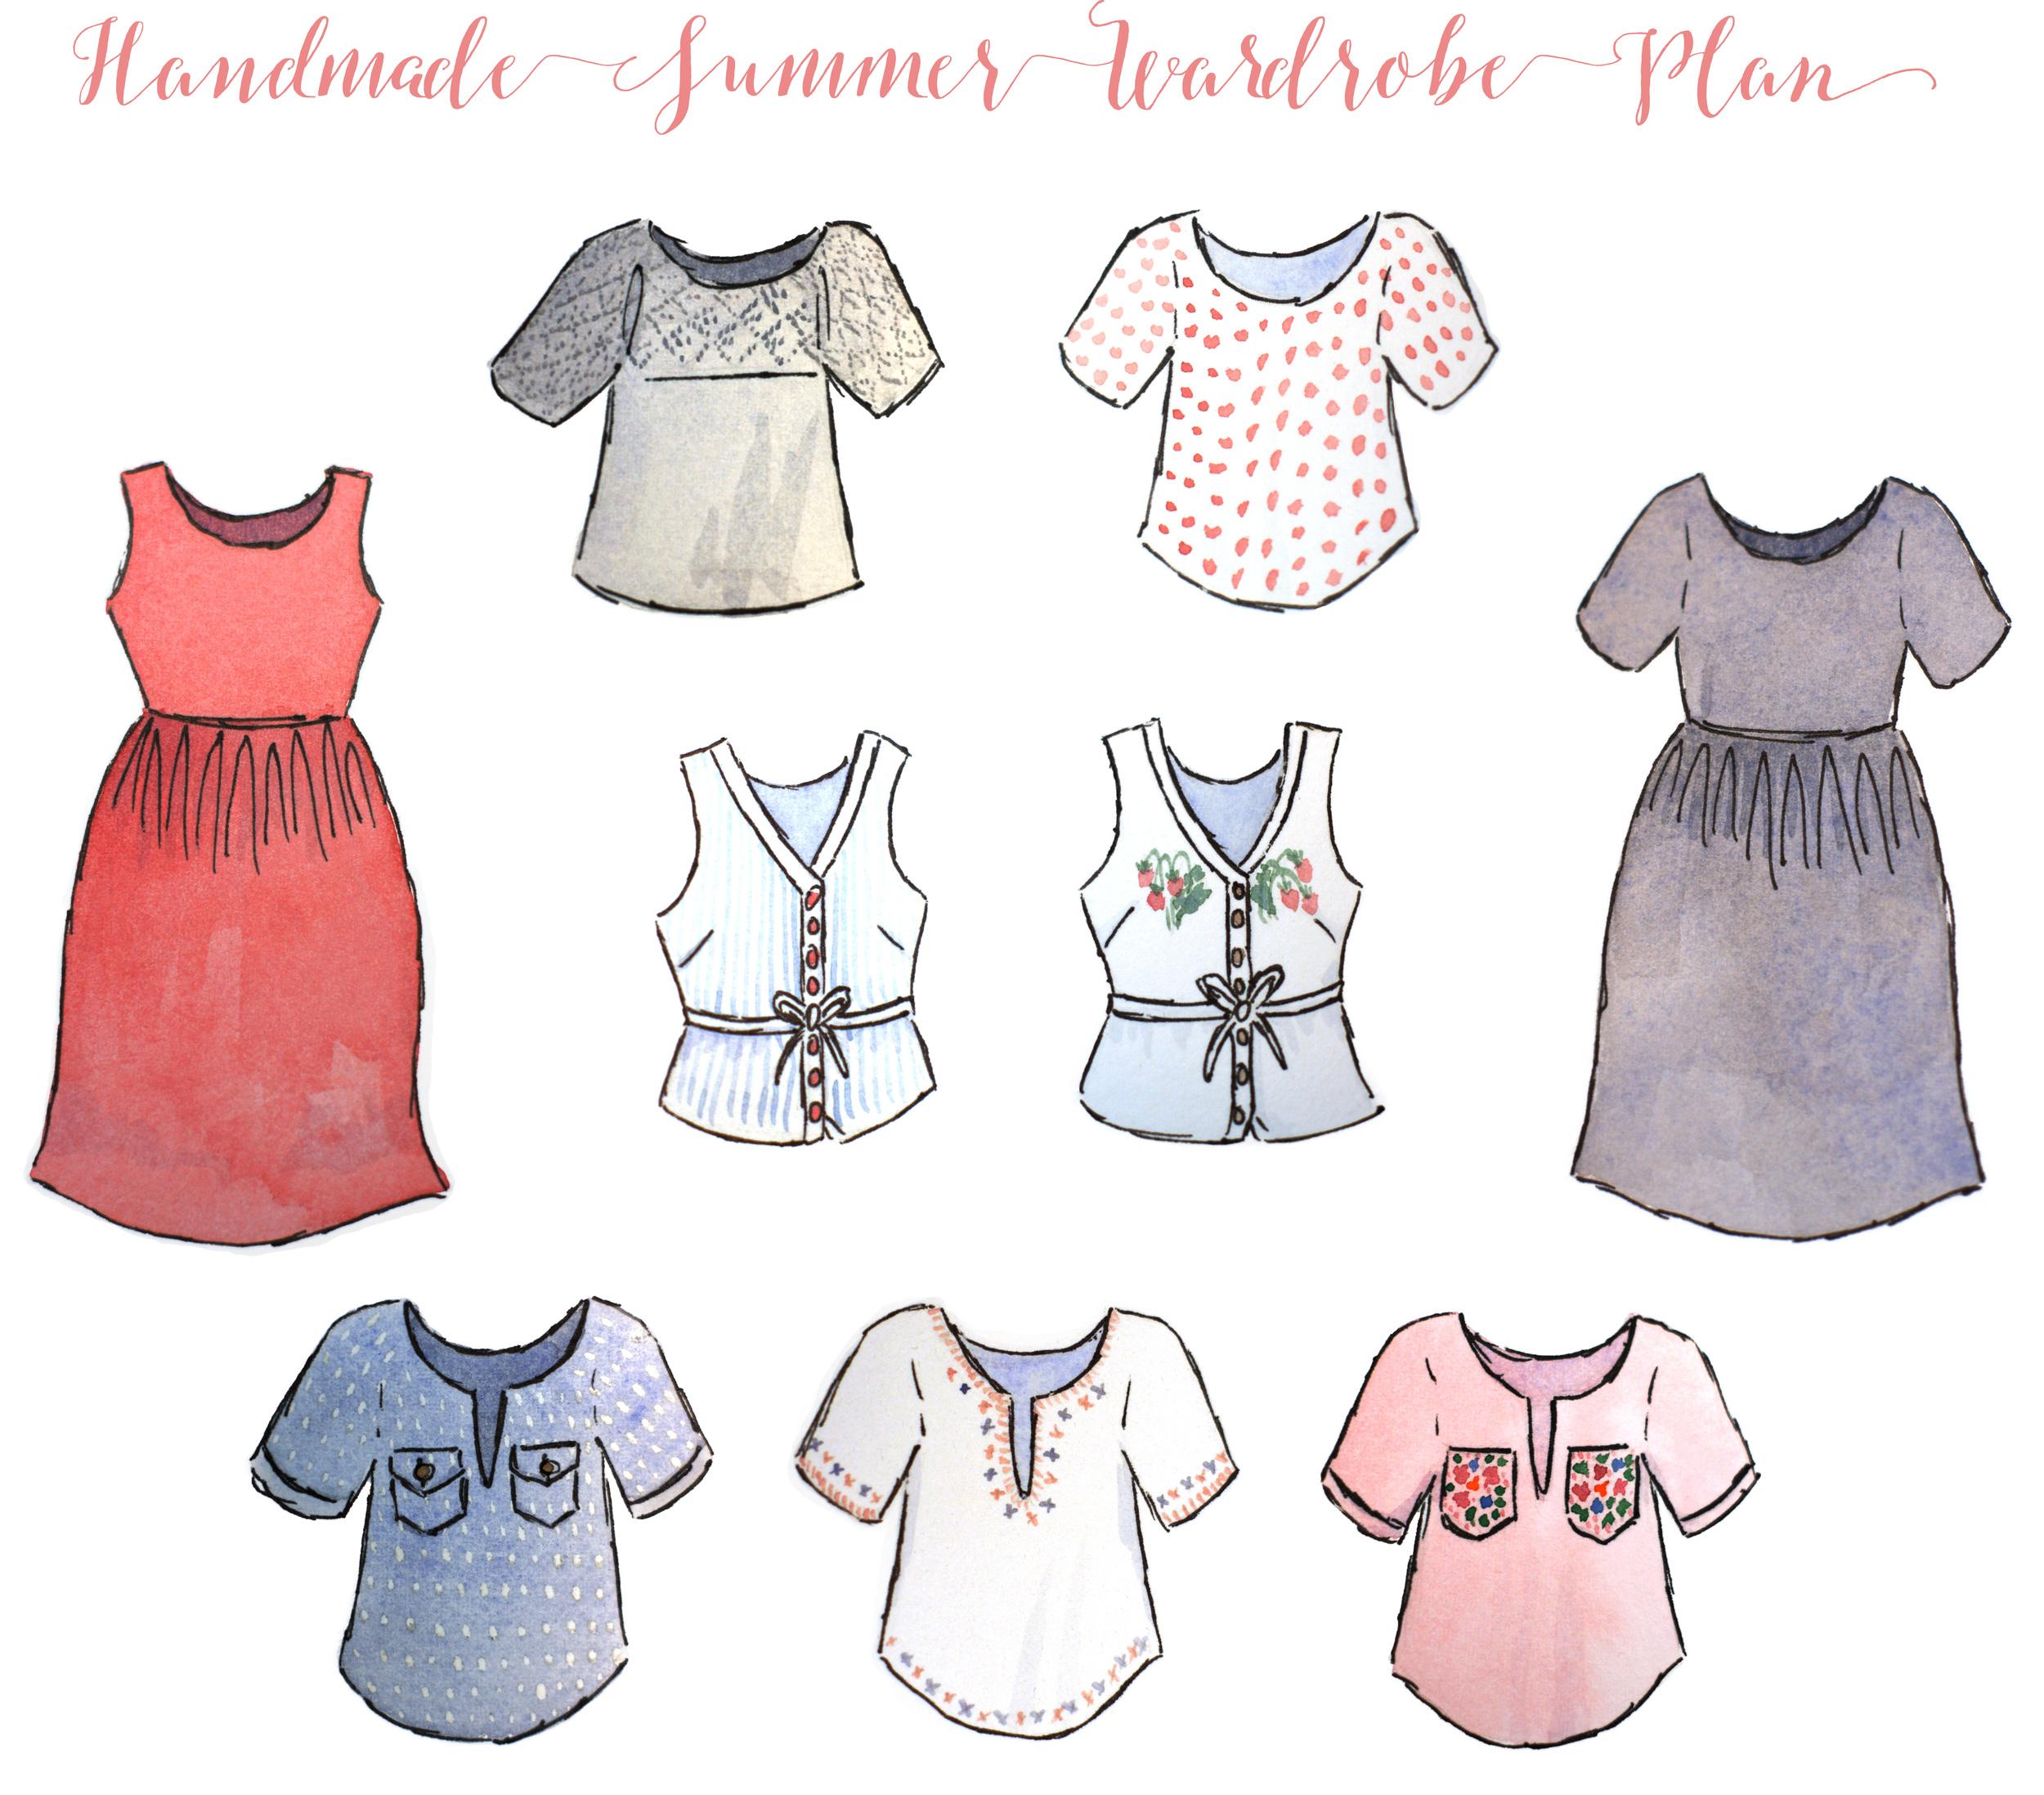 Acanthus House   Summer 2015 Handmade Wardrobe Plan